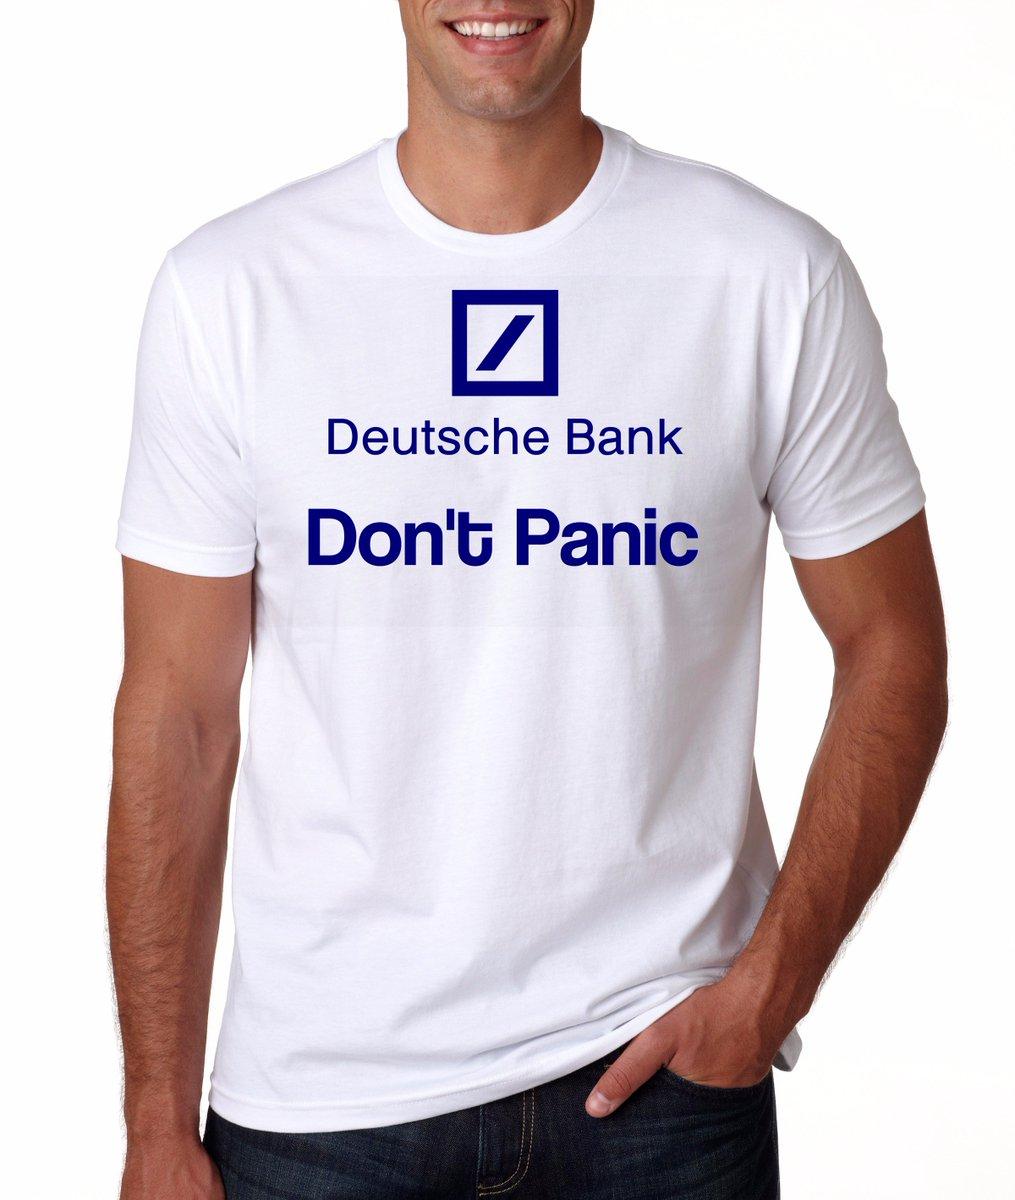 The official #DeutscheBank T-Shirt. Deutsche Bank - Don't Panic. (front view)  and (rear view) https://t.co/M6nPeIYmxH